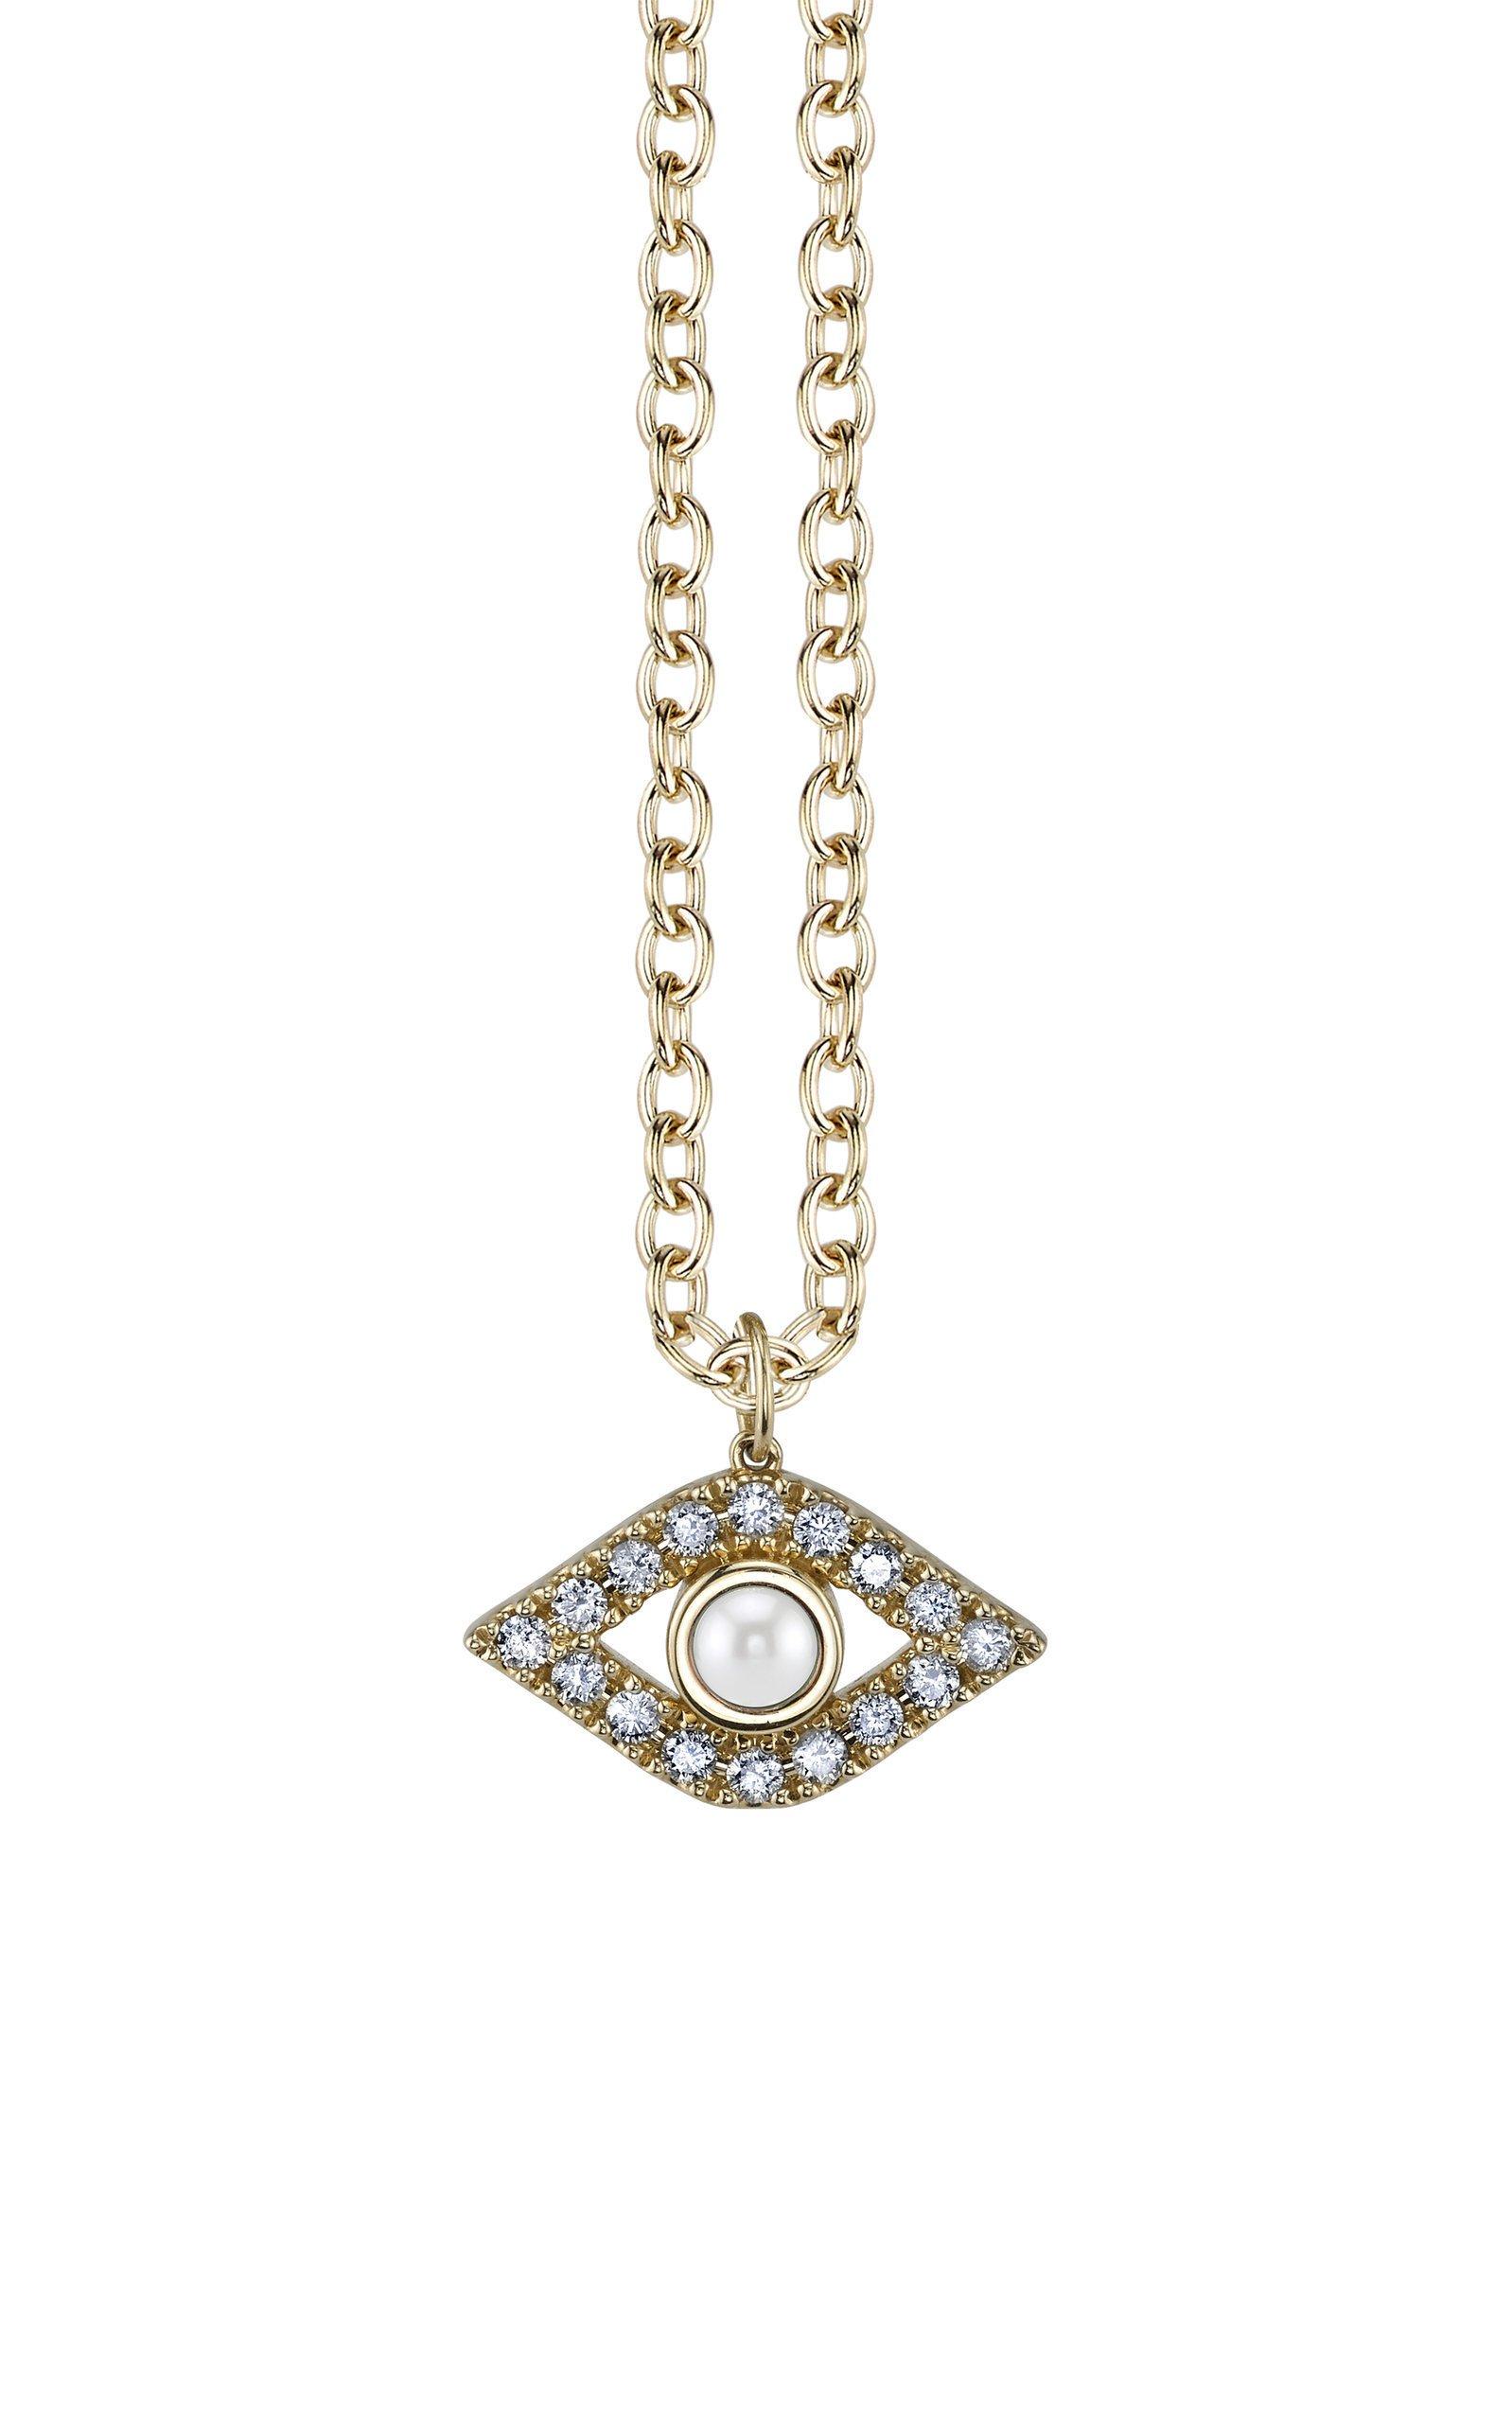 Sydney Evan Pearl And Diamond Evil Eye Necklace